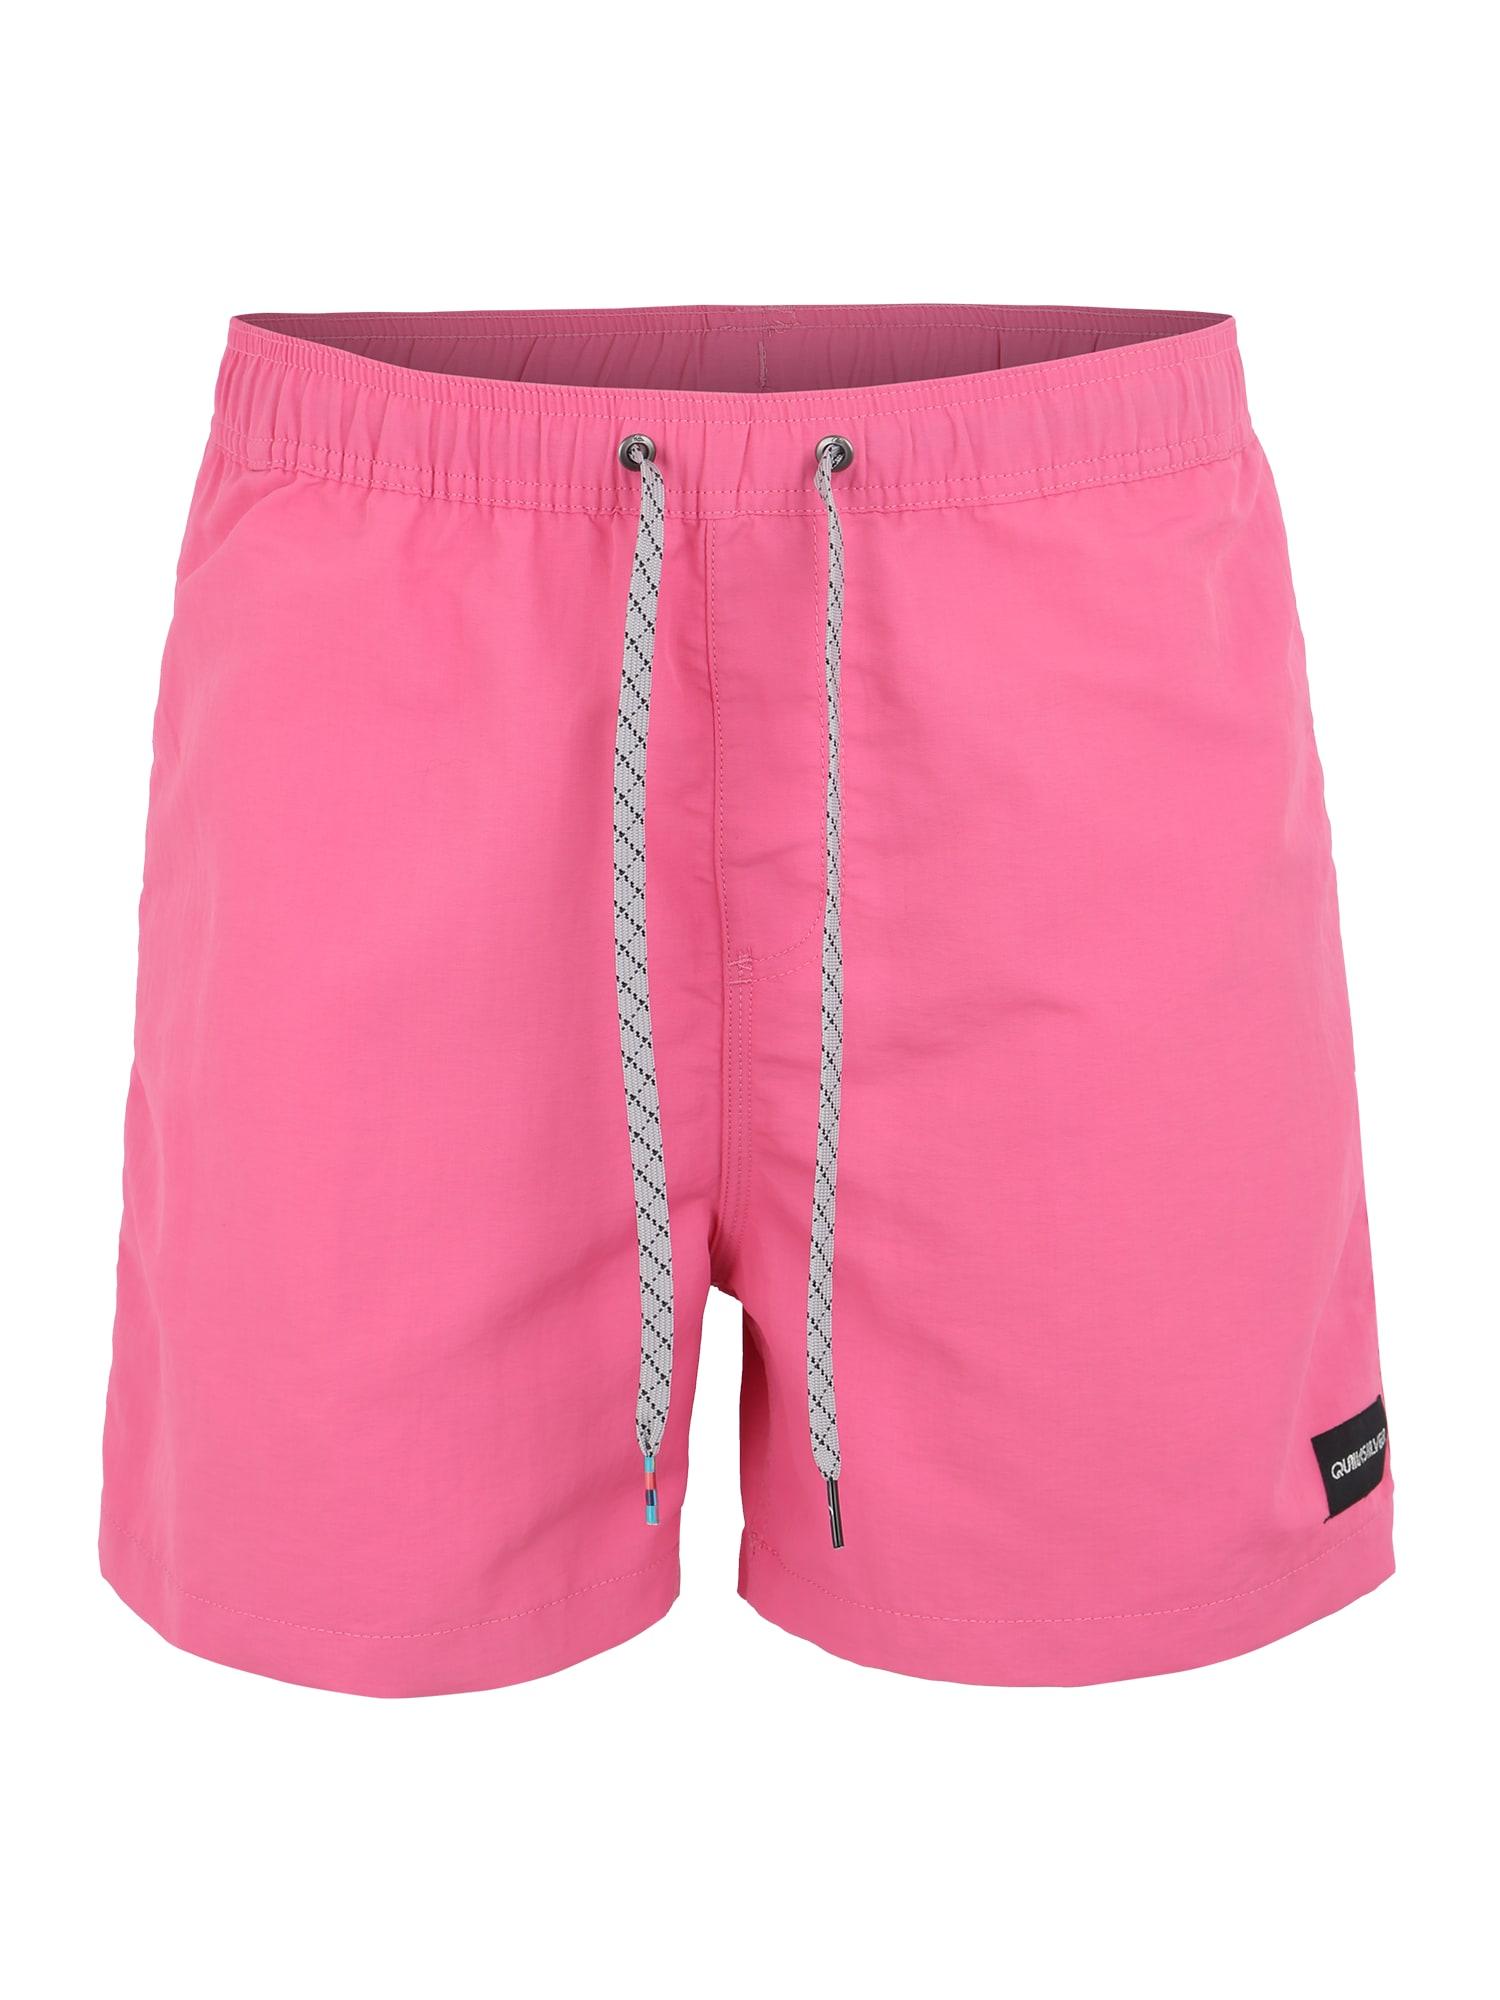 Plavecké šortky VIBES VOLLEY 16 pink QUIKSILVER